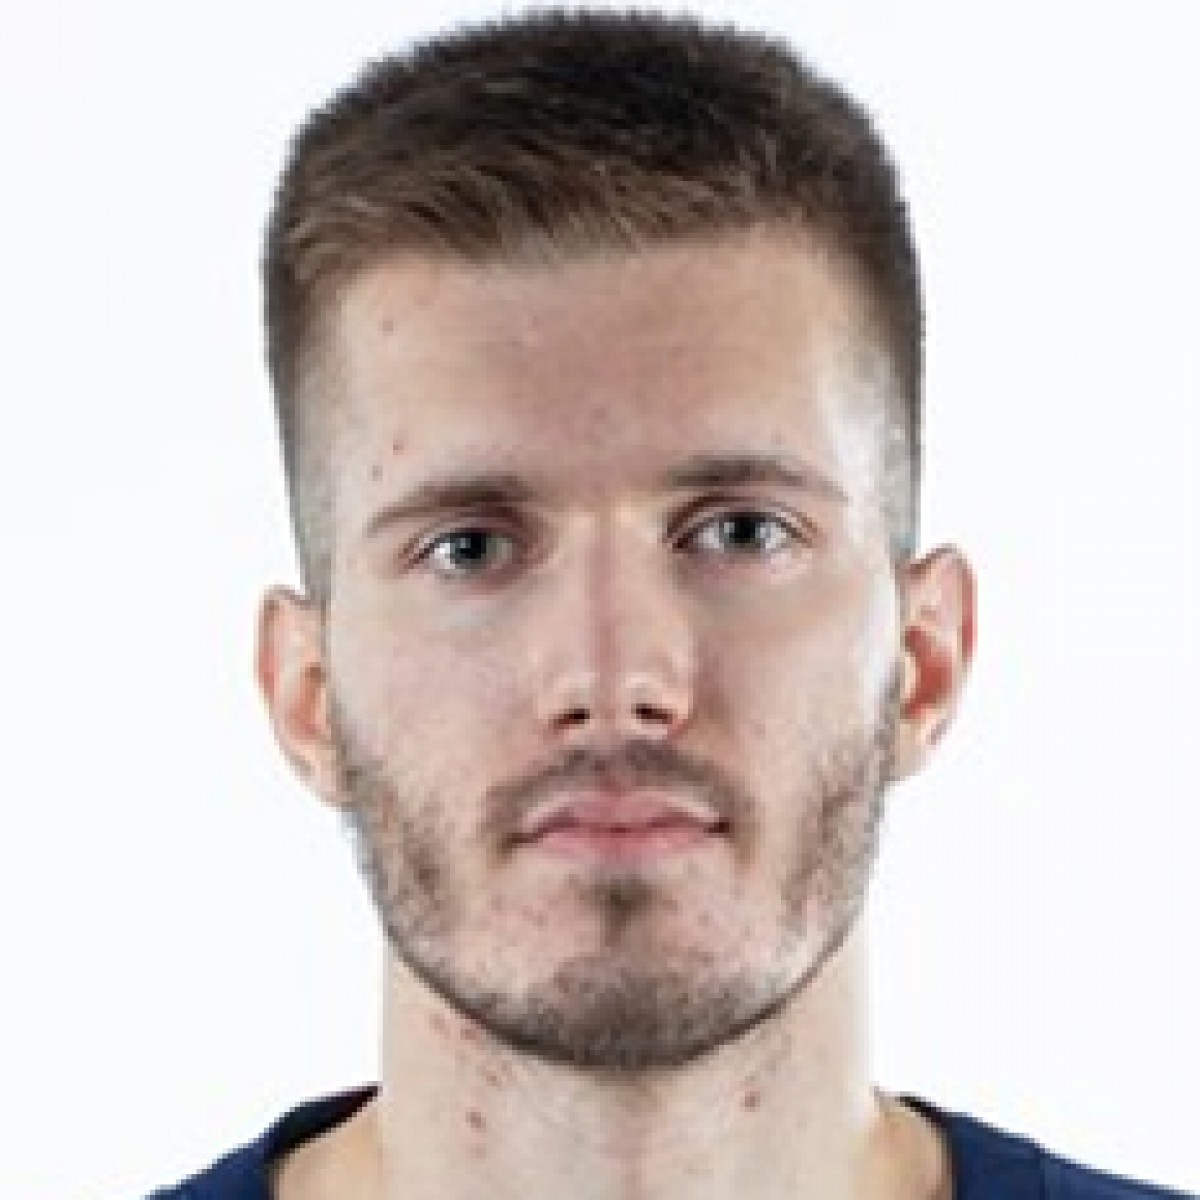 Filip Petrusev